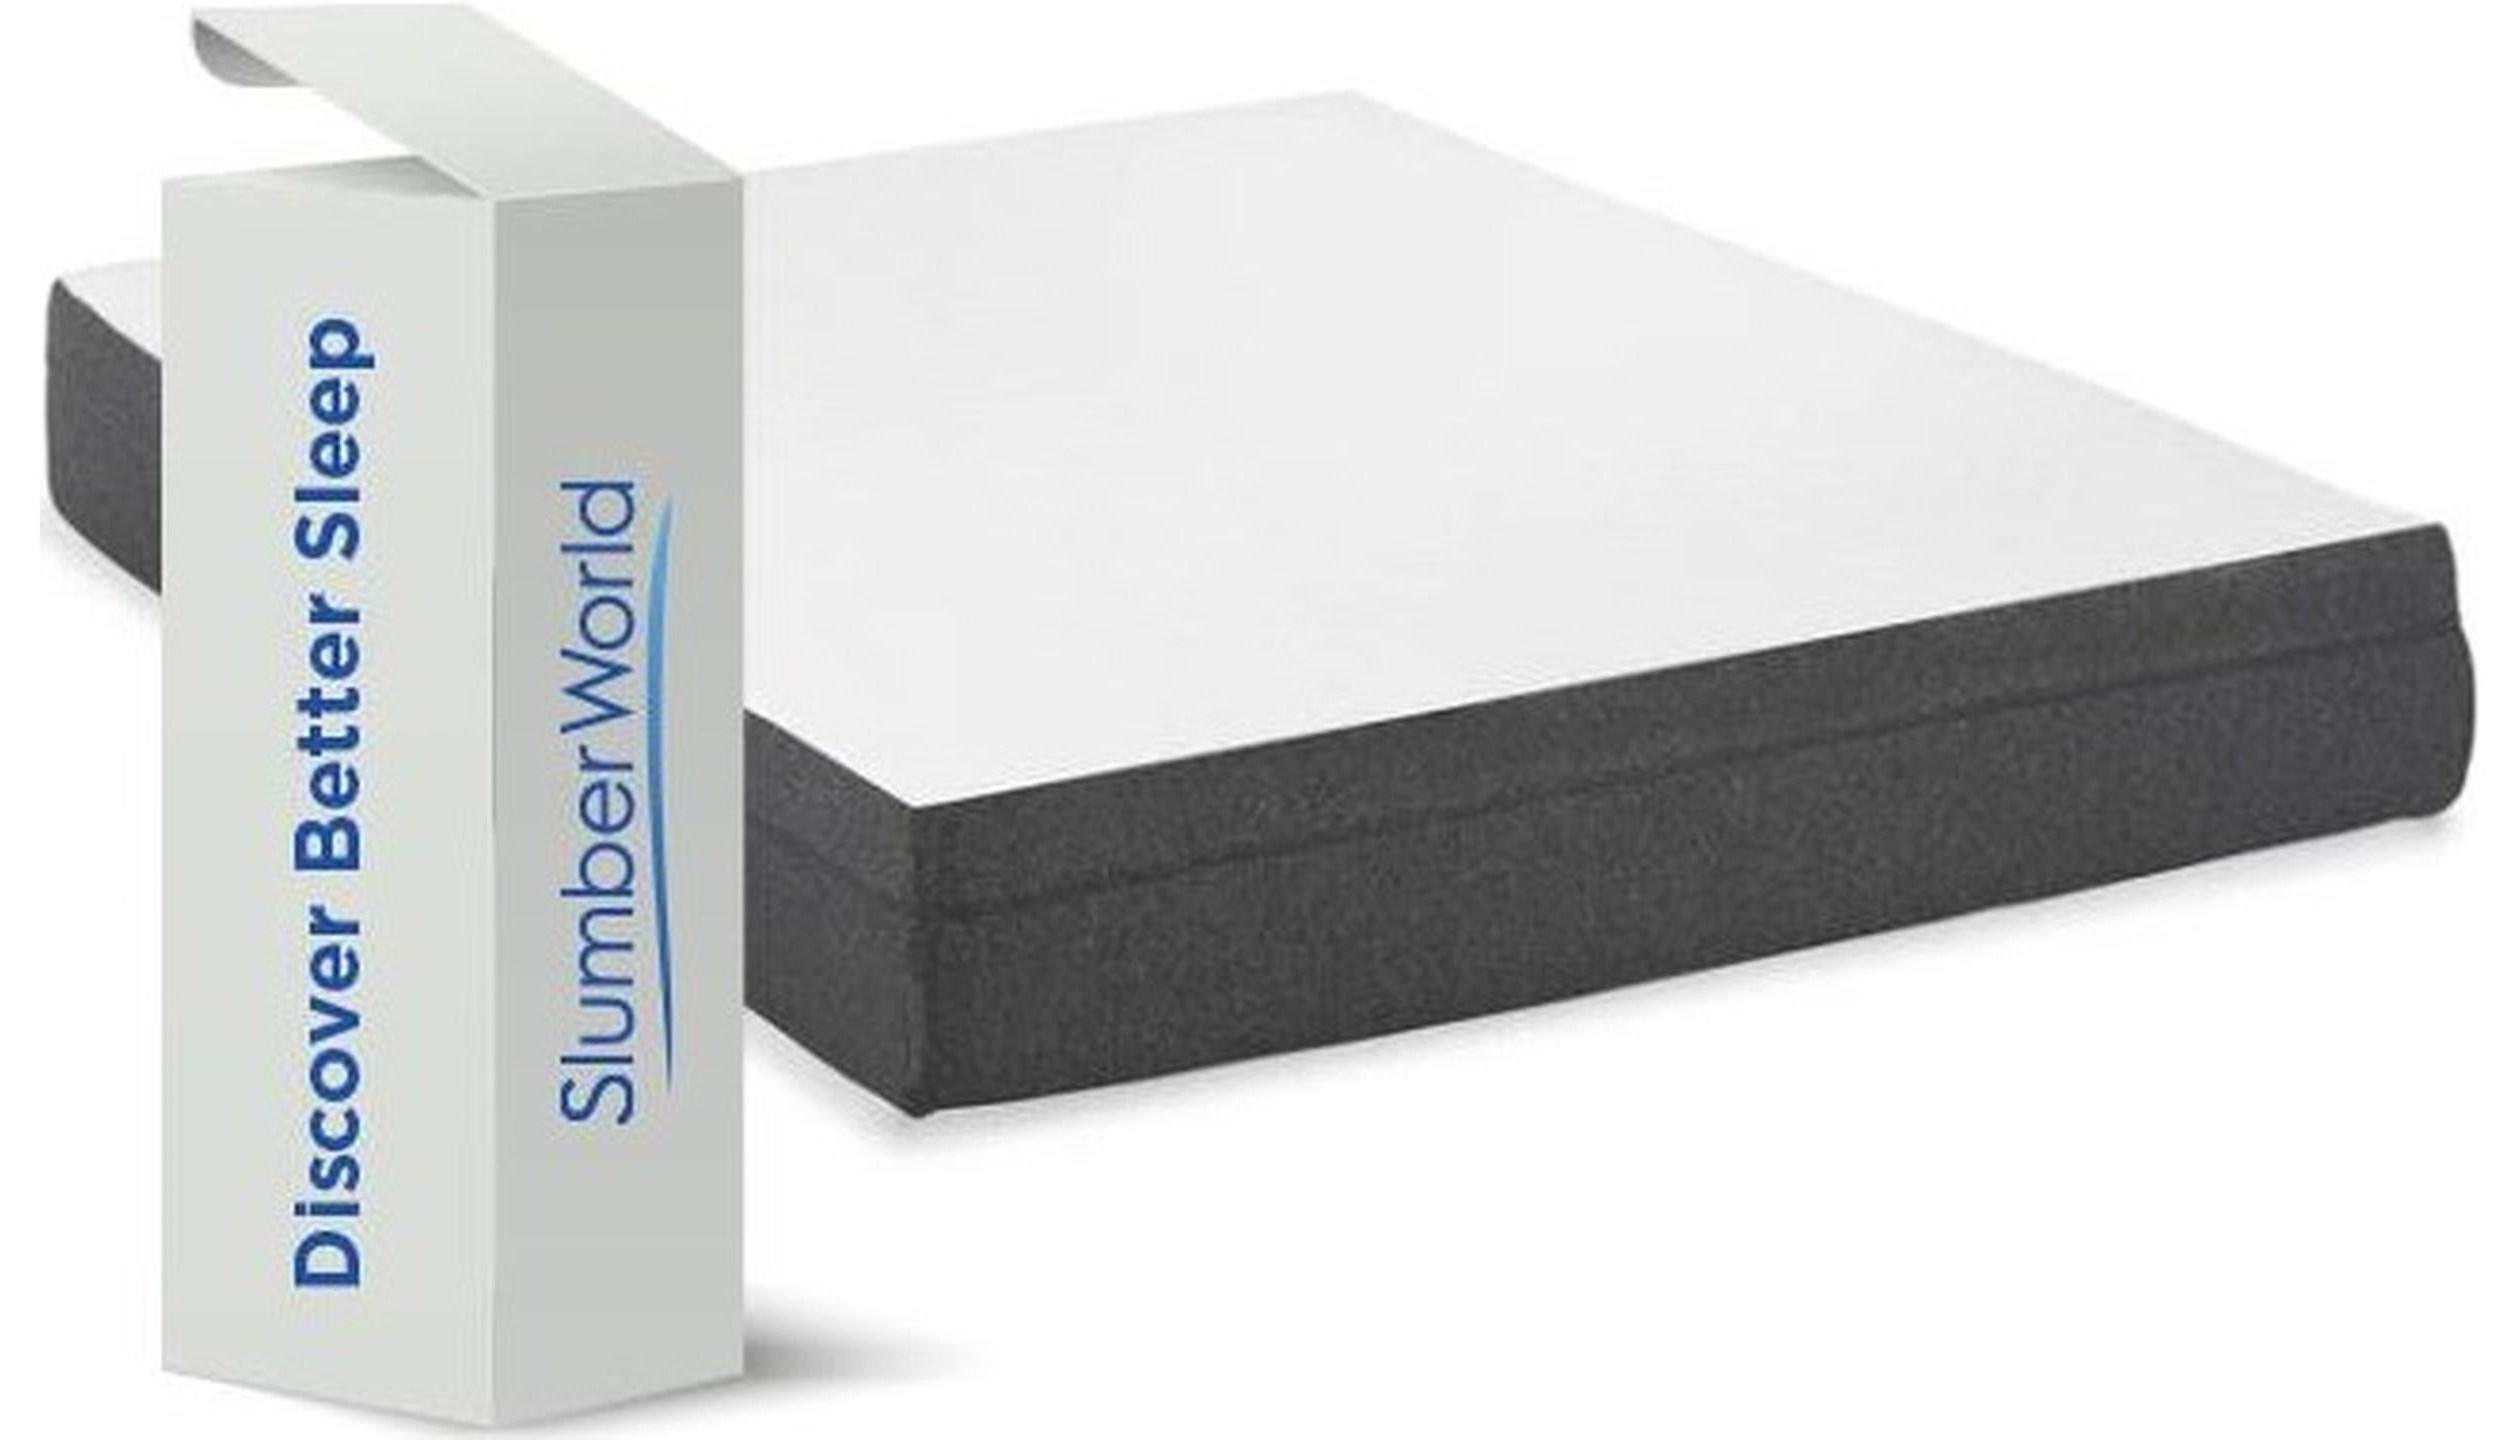 SB10 Hybrid Reactive Mattress by South Bay International at SlumberWorld